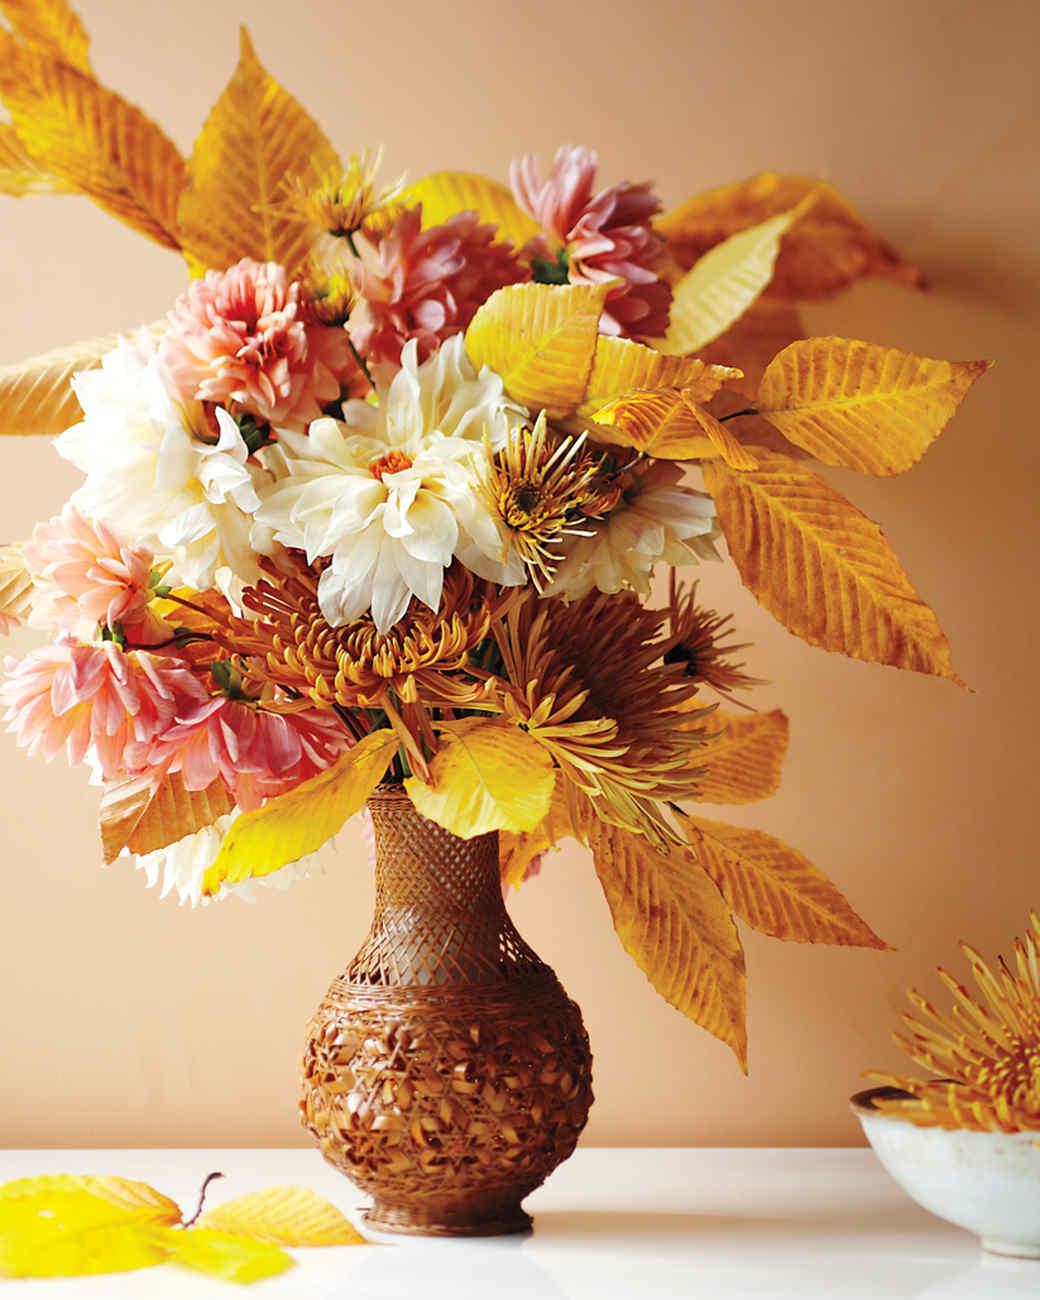 fall-arrangements-4-mld108163.jpg